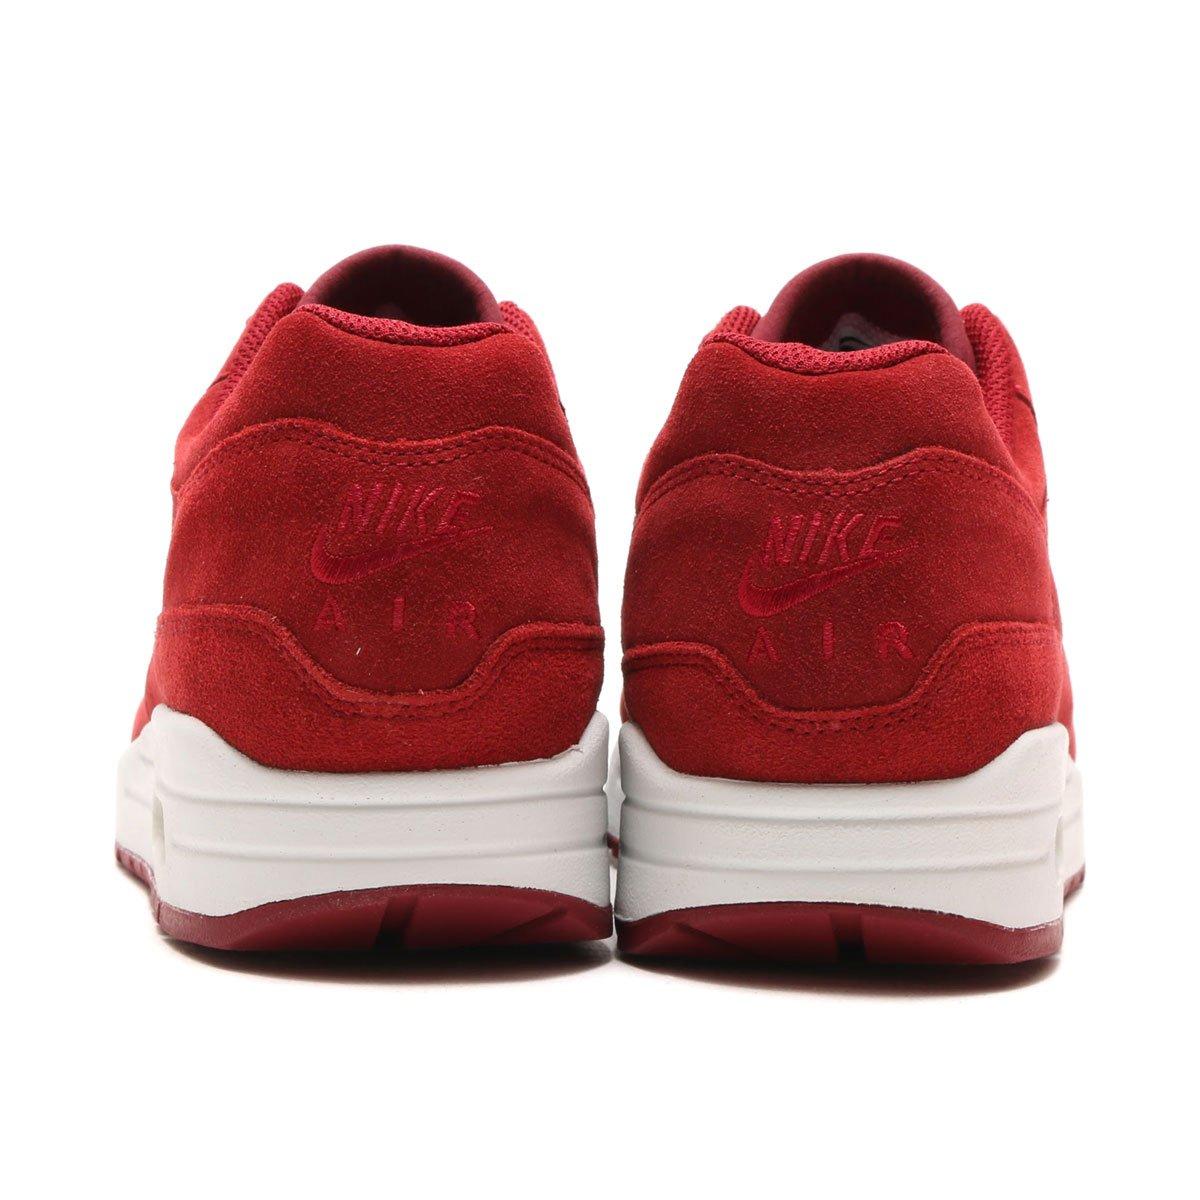 air max 1 jewel team red